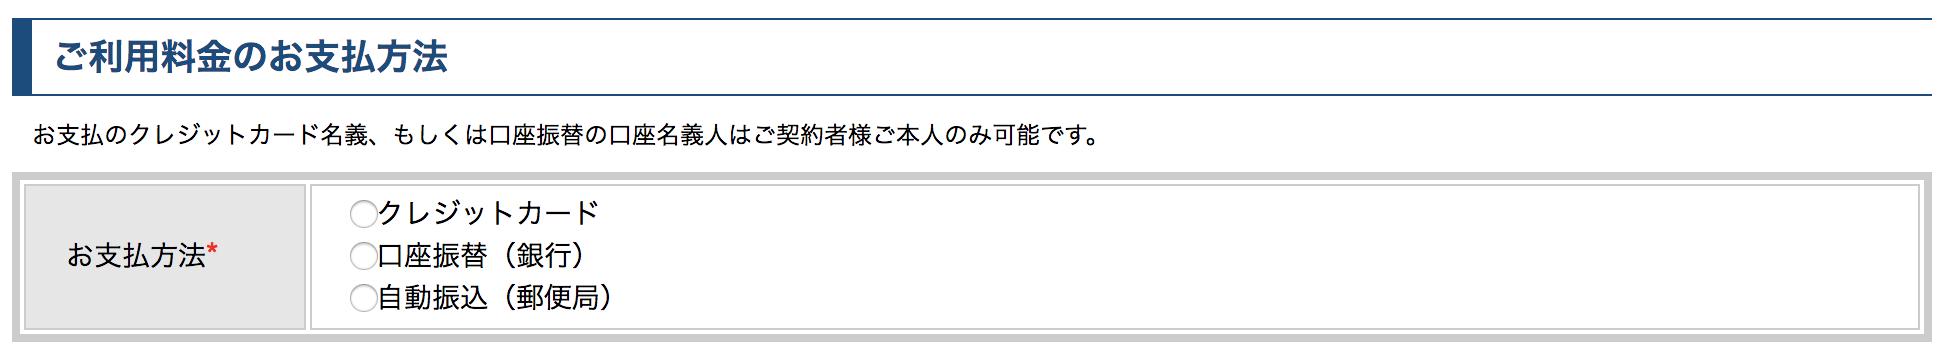 【iPhoneSE×UQモバイル口座振替】口座振替が選択できる